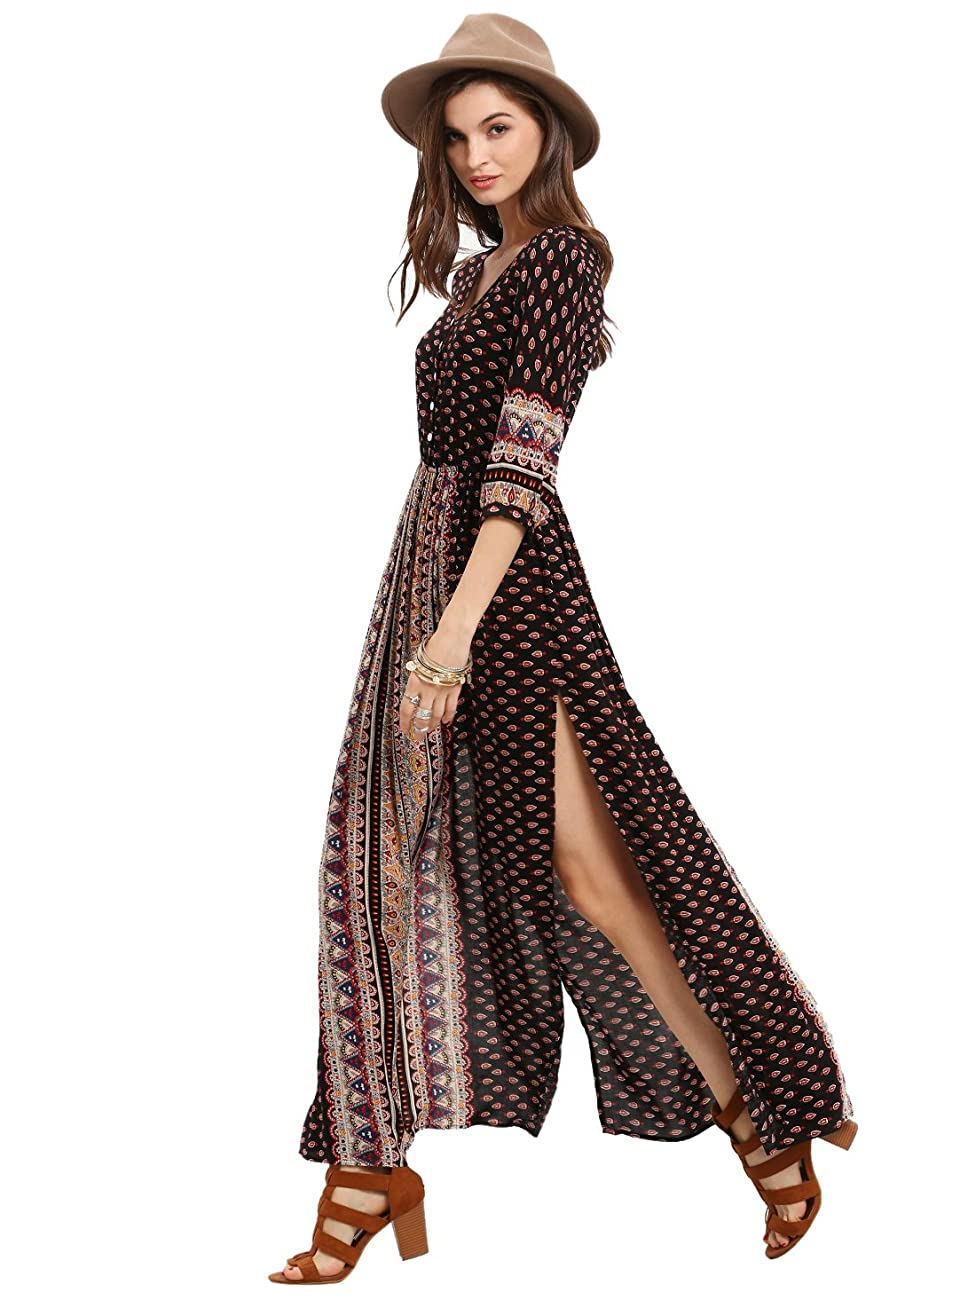 ROMWE Women's Summer Casual Half Sleeve Vintage Print Split Maxi Dress 0